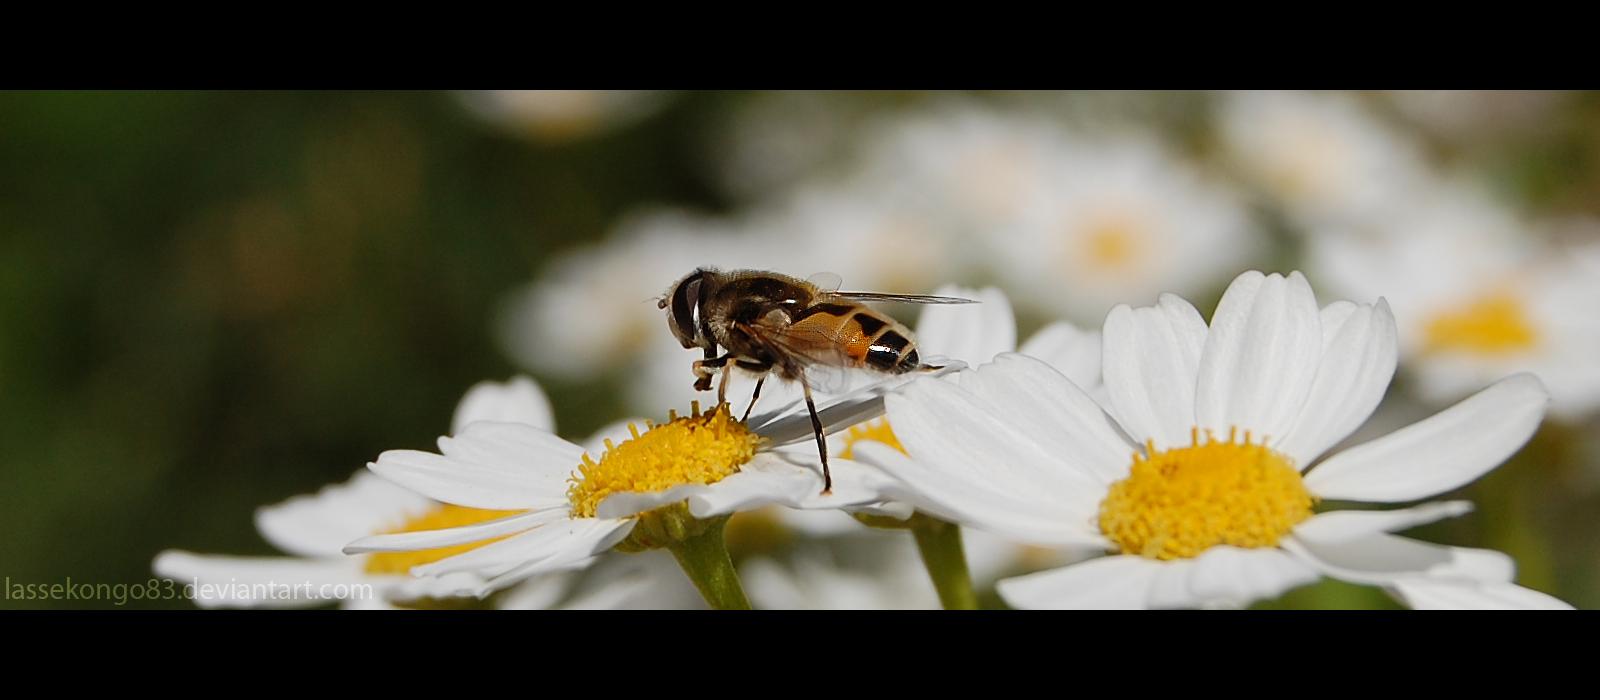 Nectar plz by lassekongo83